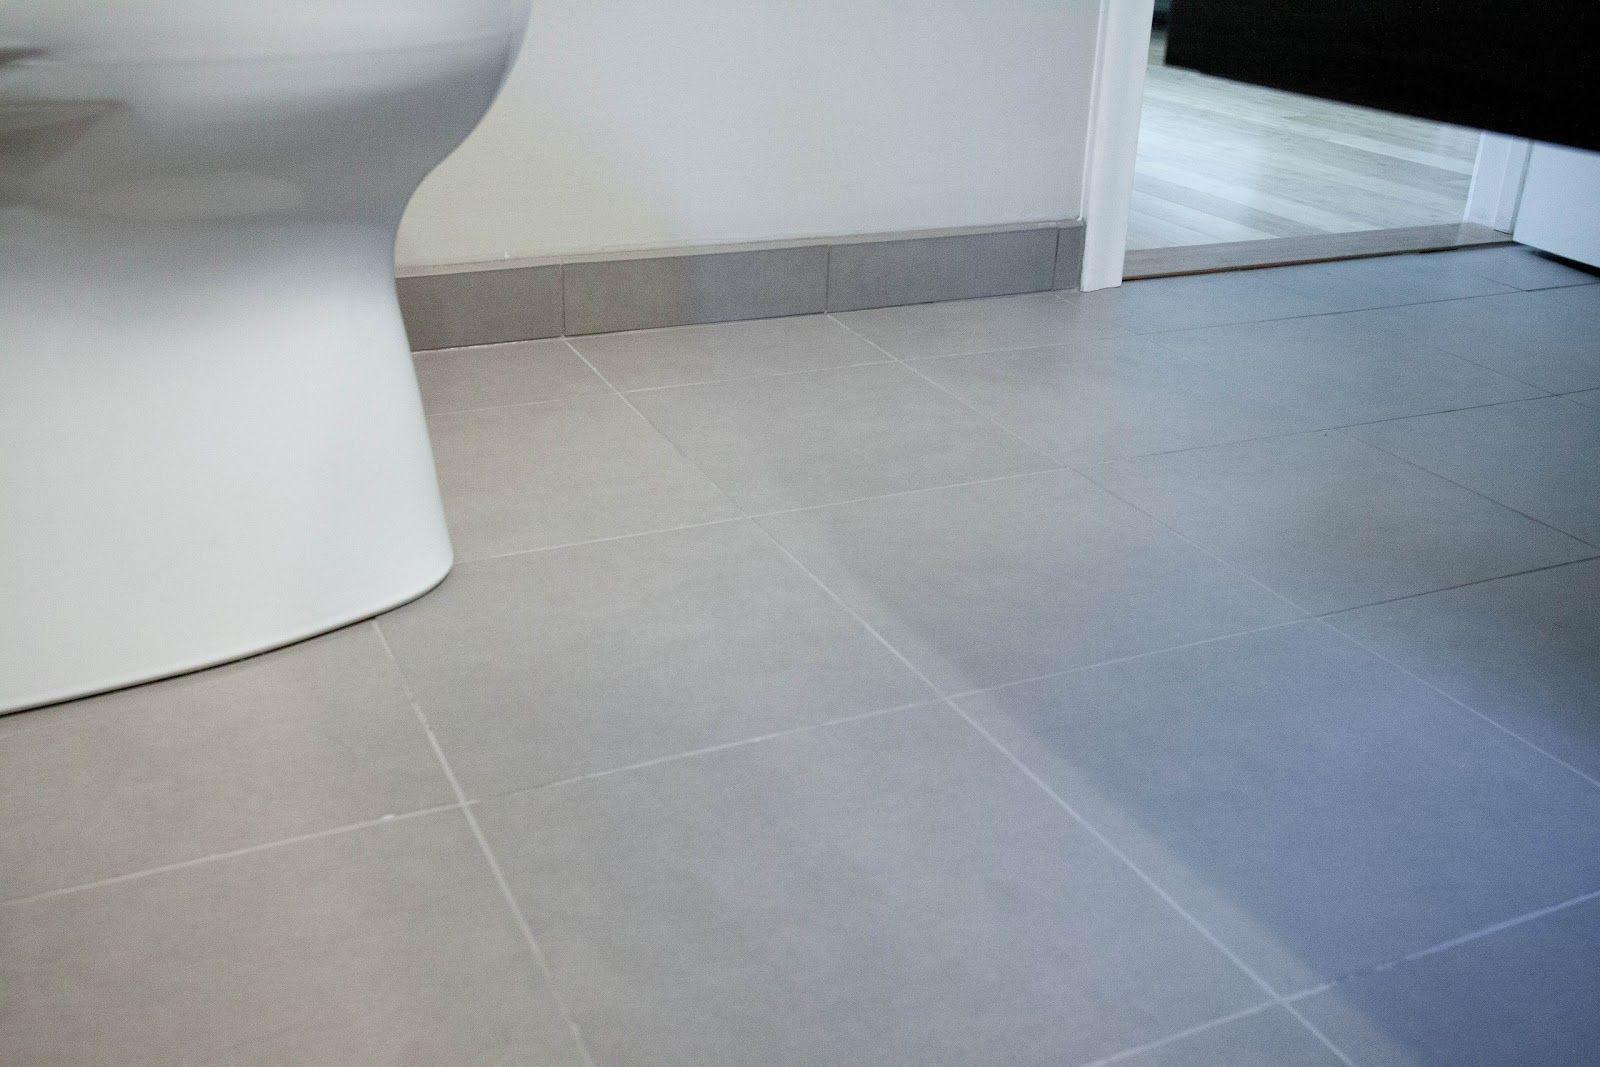 Bathroom Baseboard Ideas bathroom tile baseboard ideas   bathroom exclusiv   pinterest